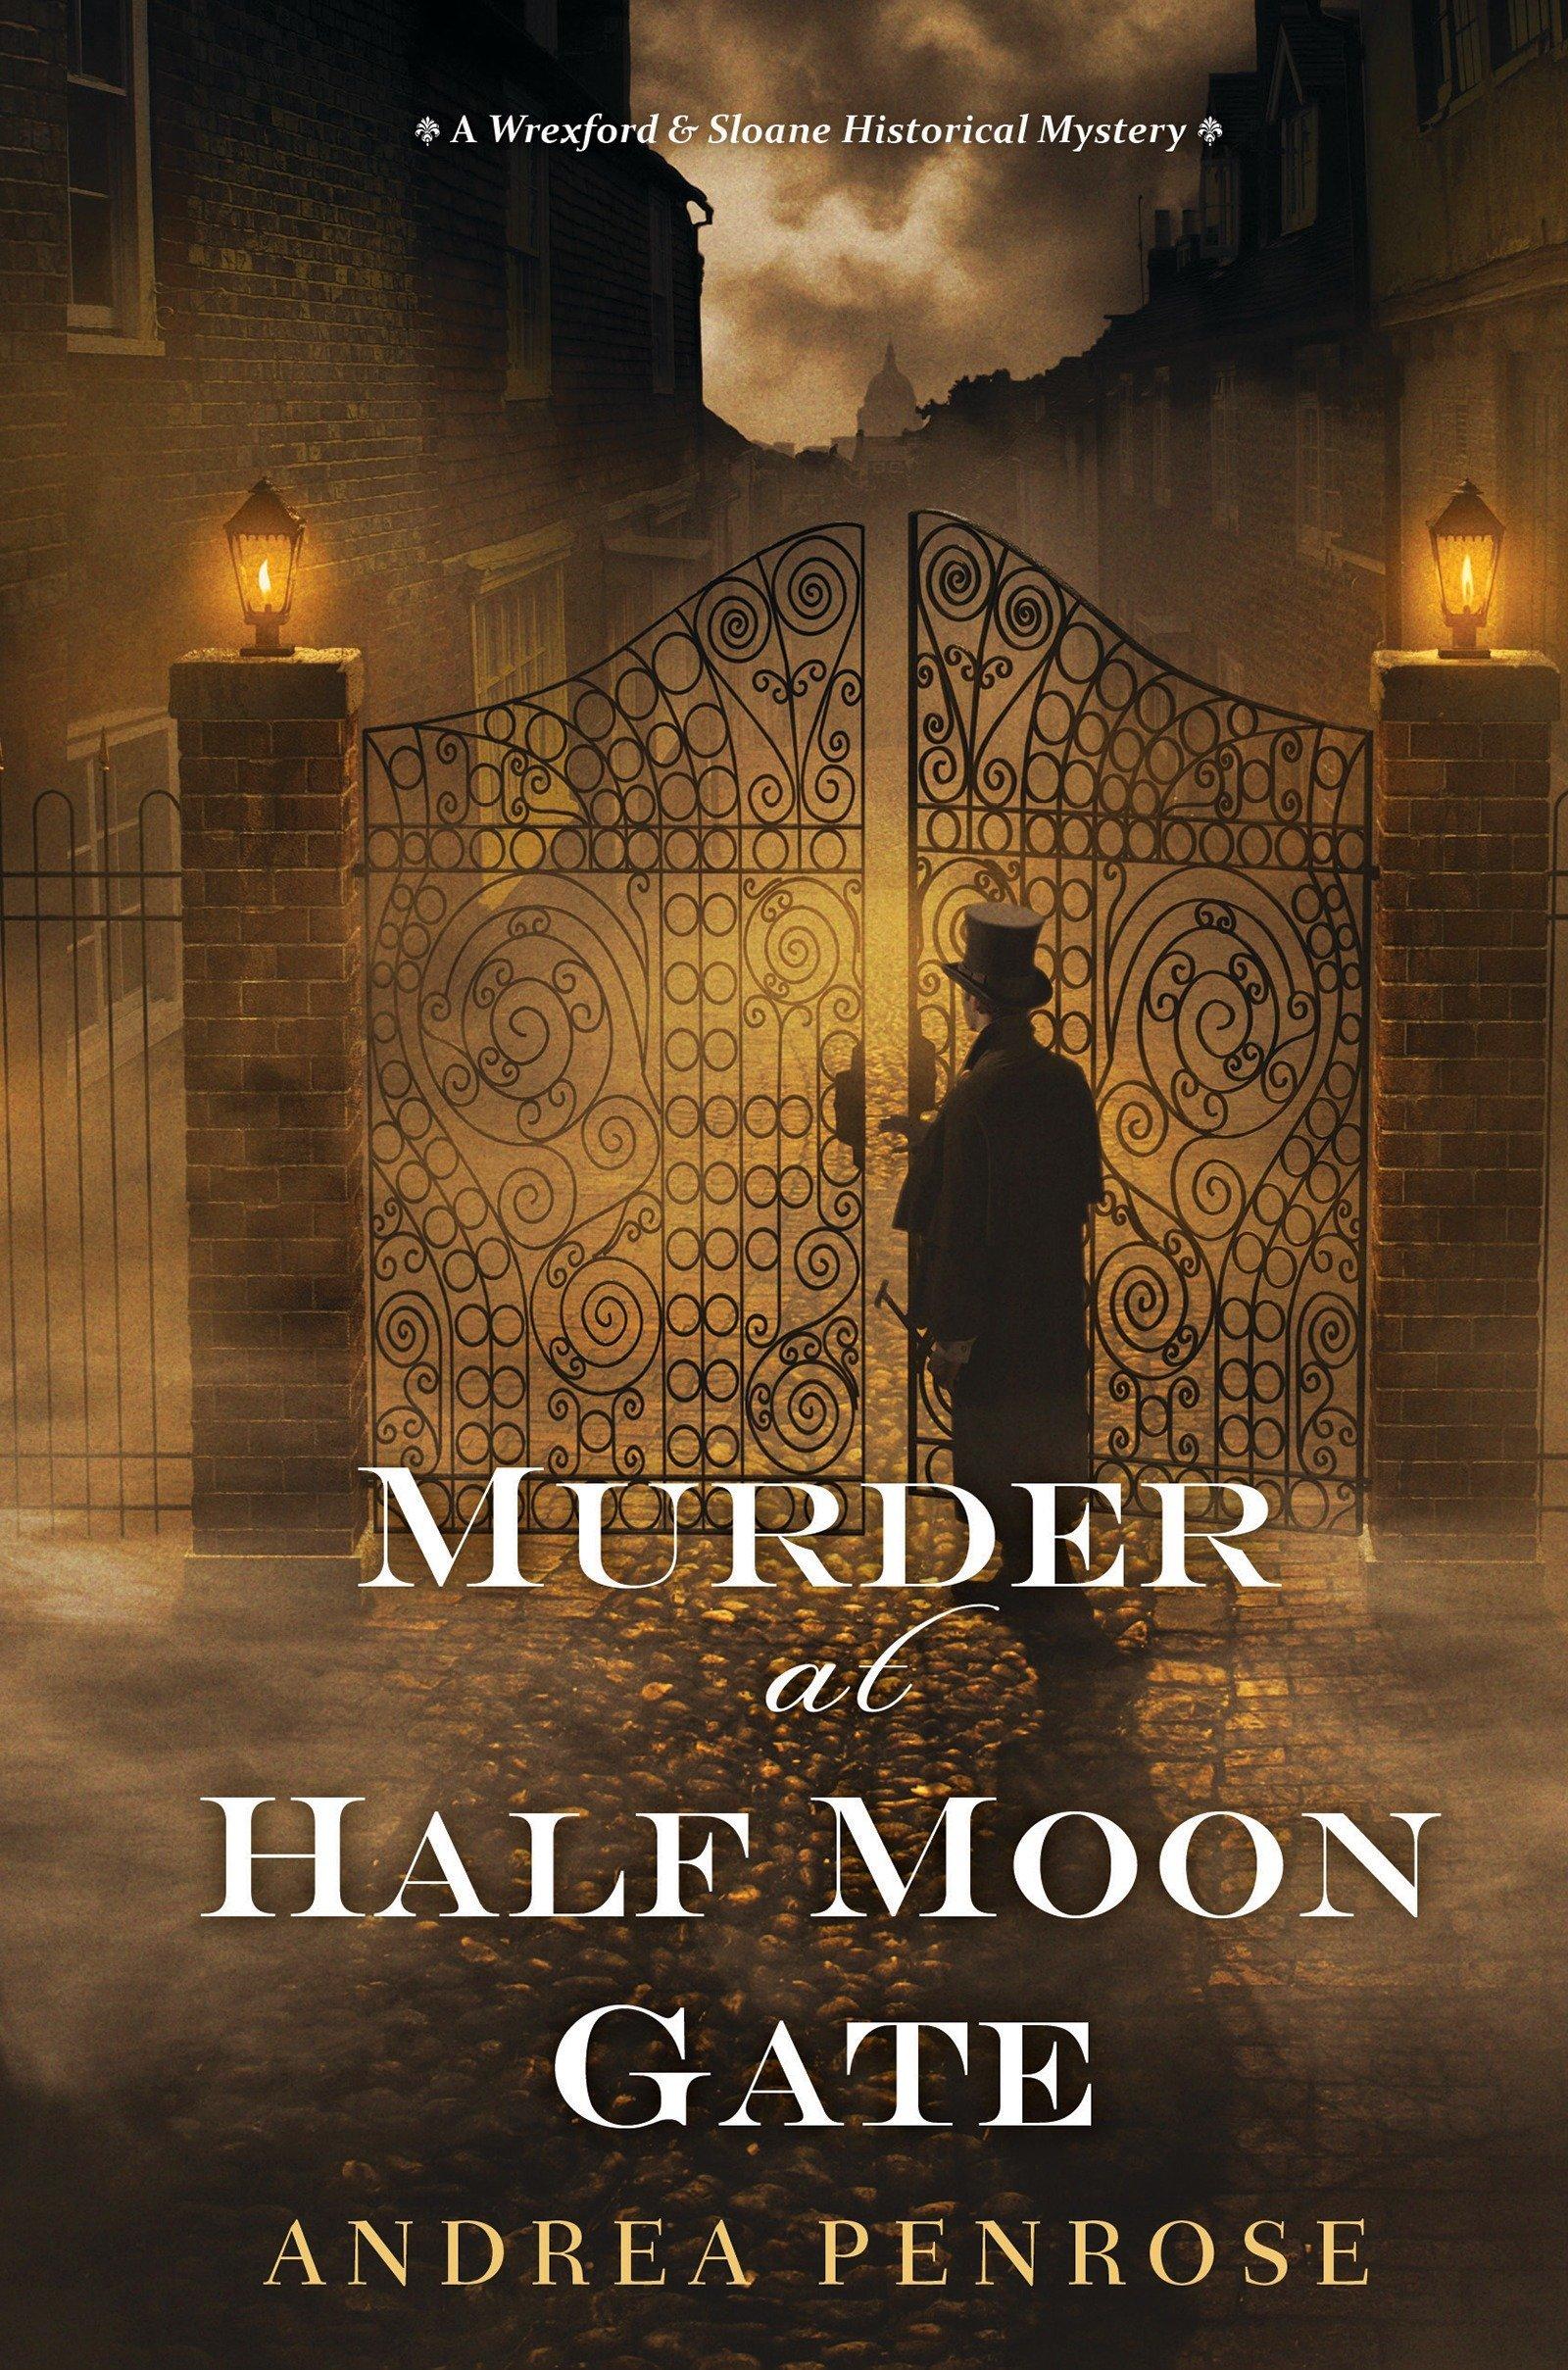 Murder at Half Moon Gate (A Wrexford & Sloane Mystery)